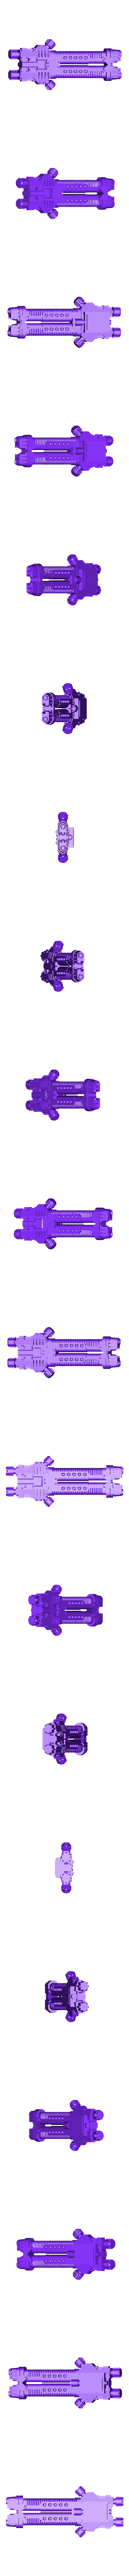 Plasma_Cannonade.stl Download free STL file Plasma Carronade • Design to 3D print, GarinC3D